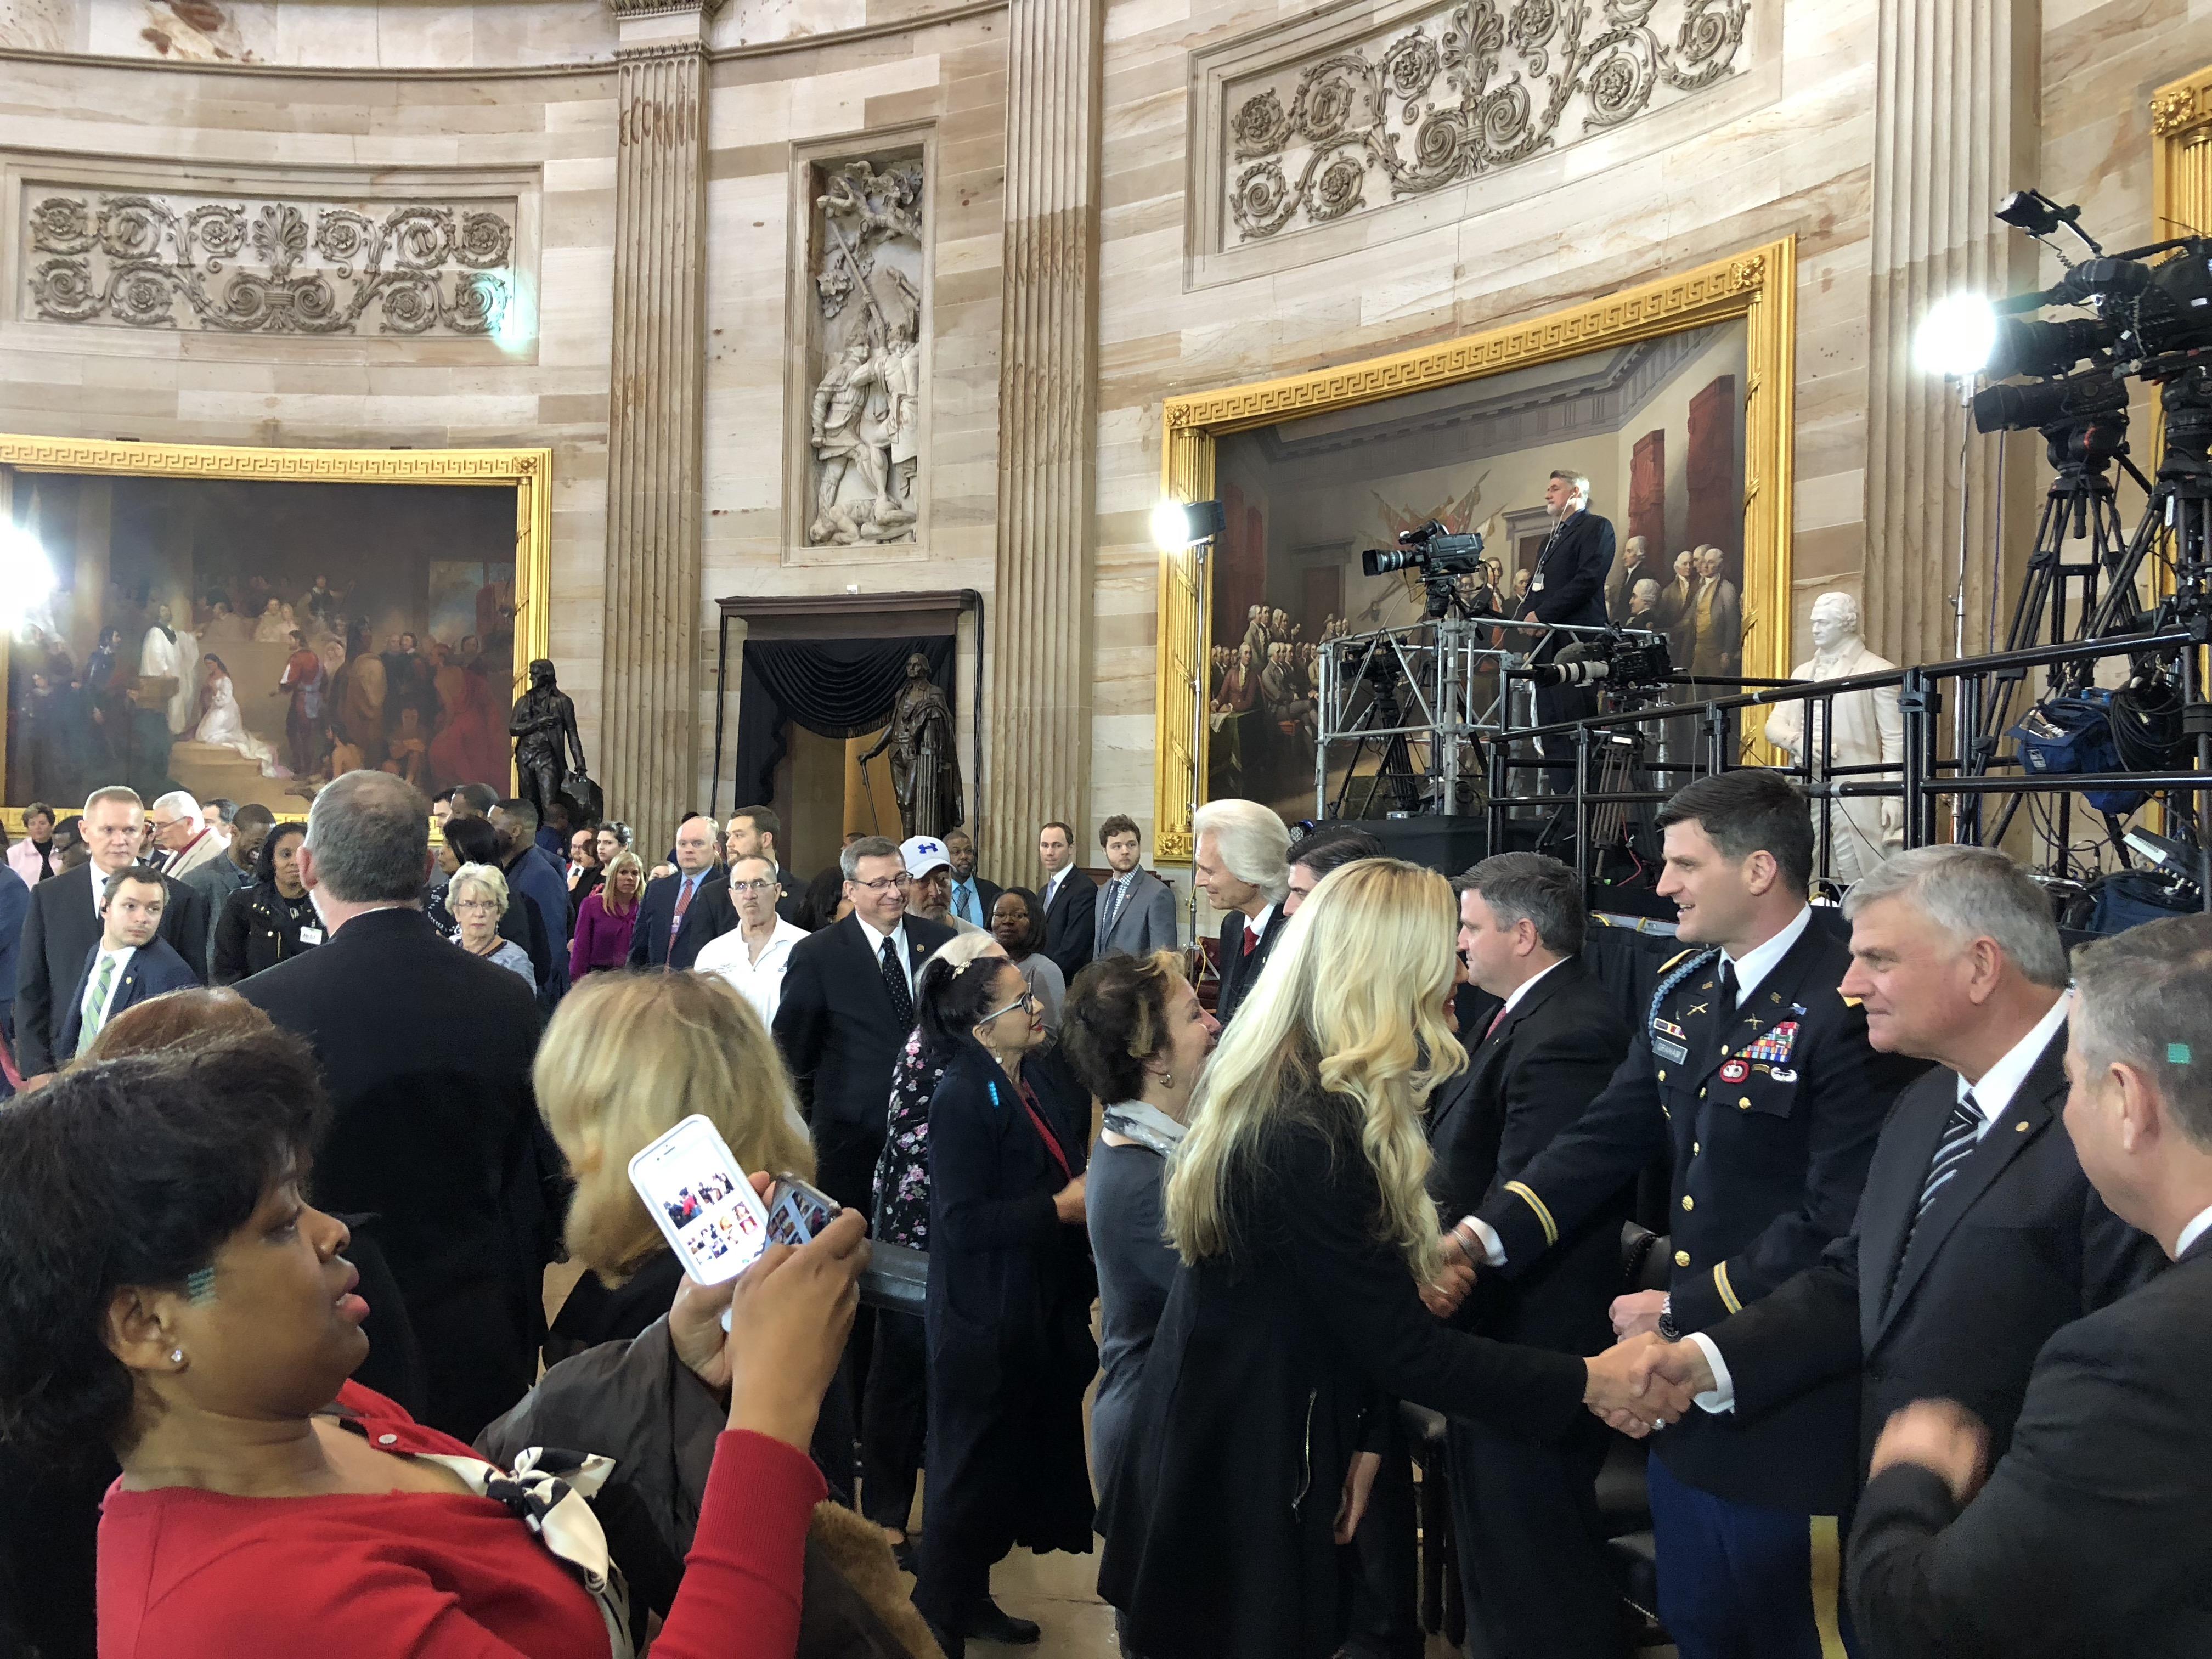 President Trump, Congressional leadership speak at service honoring Rev. Billy Graham